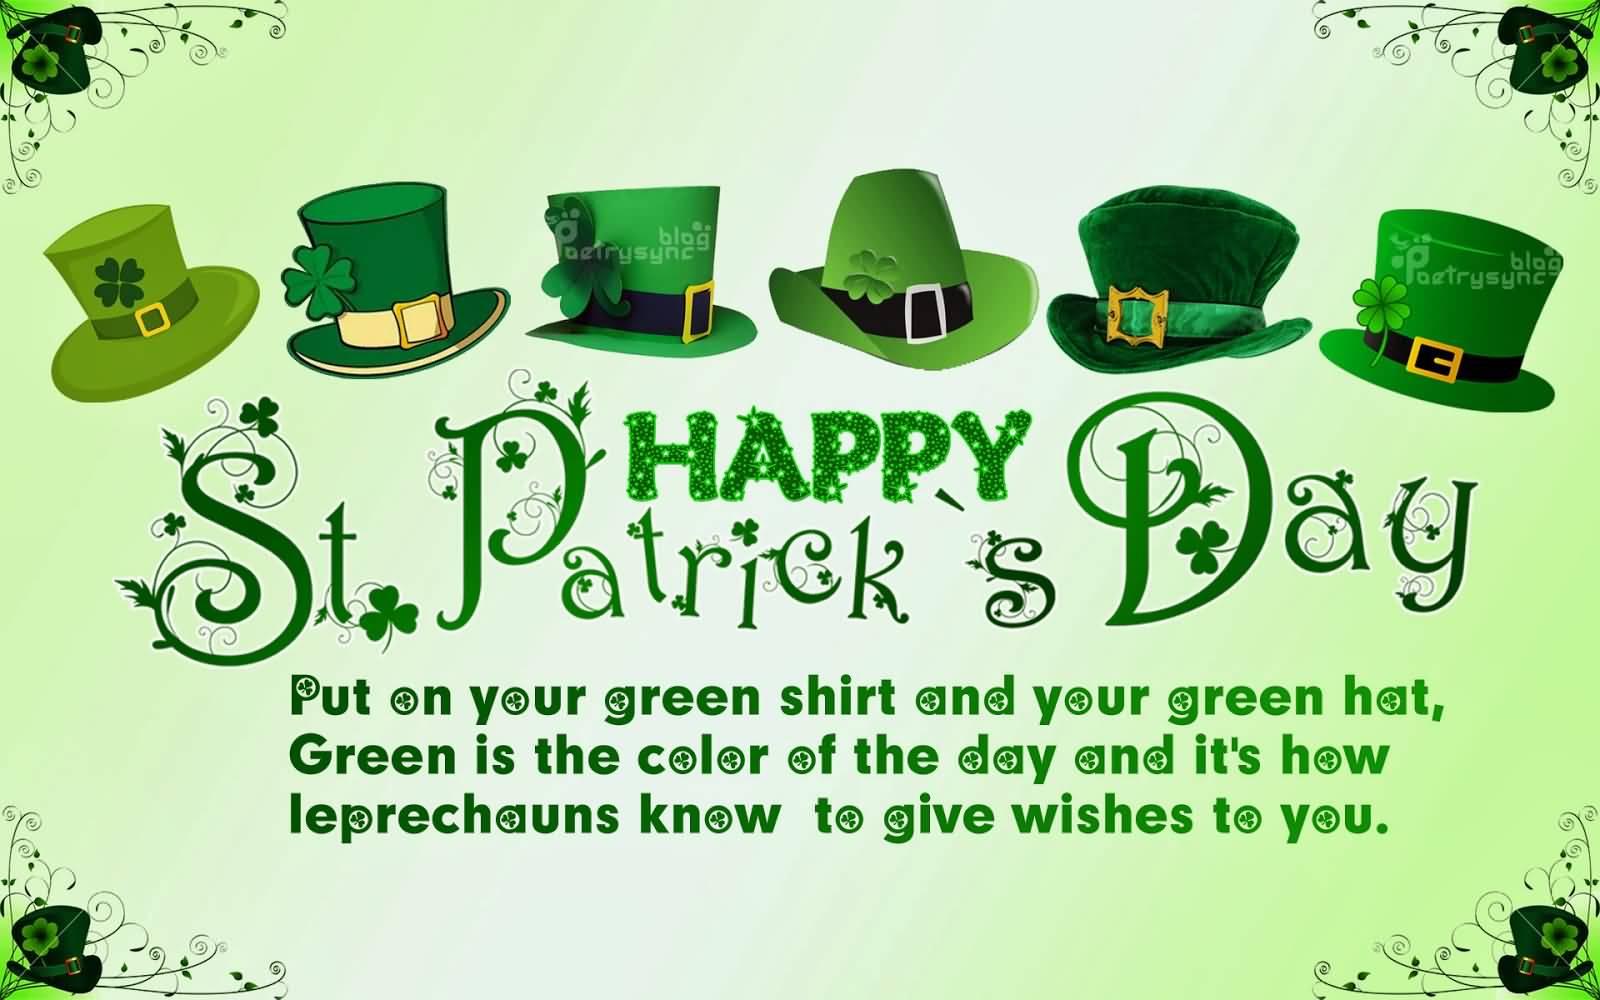 St. Patrick's Day Wish 07